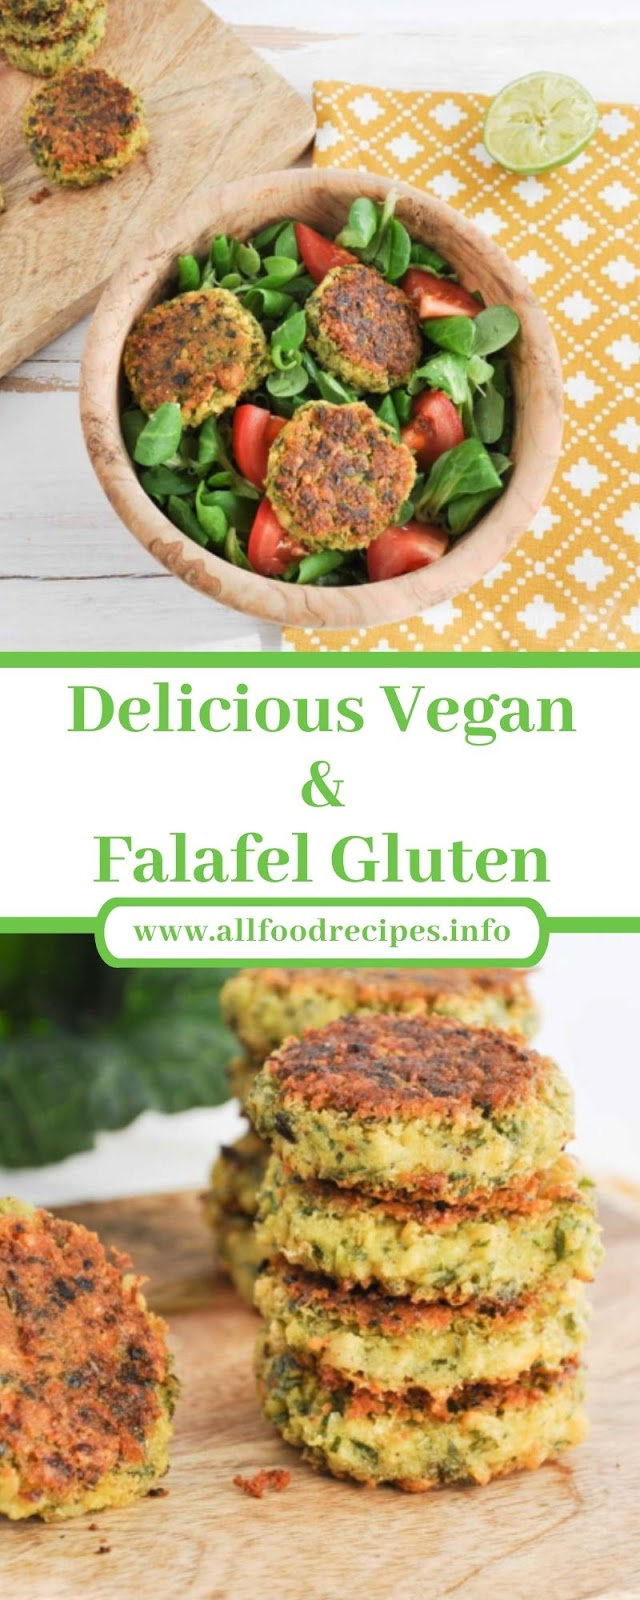 Delicious Vegan & Falafel Gluten